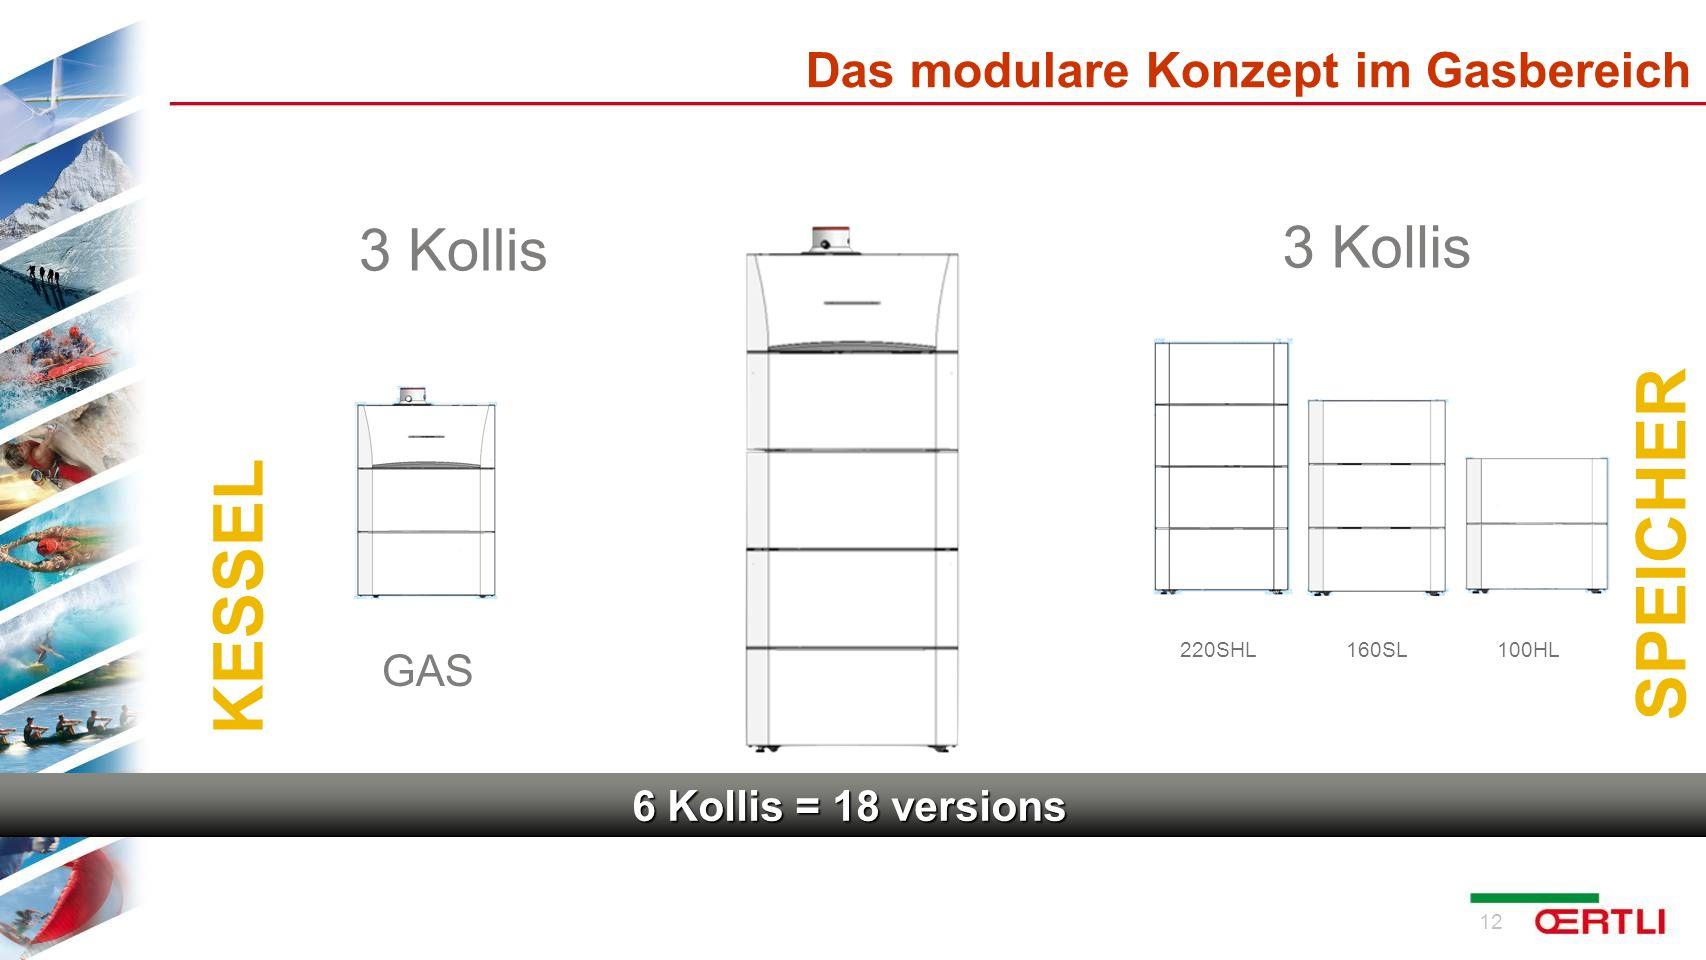 SPEICHER KESSEL 3 Kollis 3 Kollis Das modulare Konzept im Gasbereich